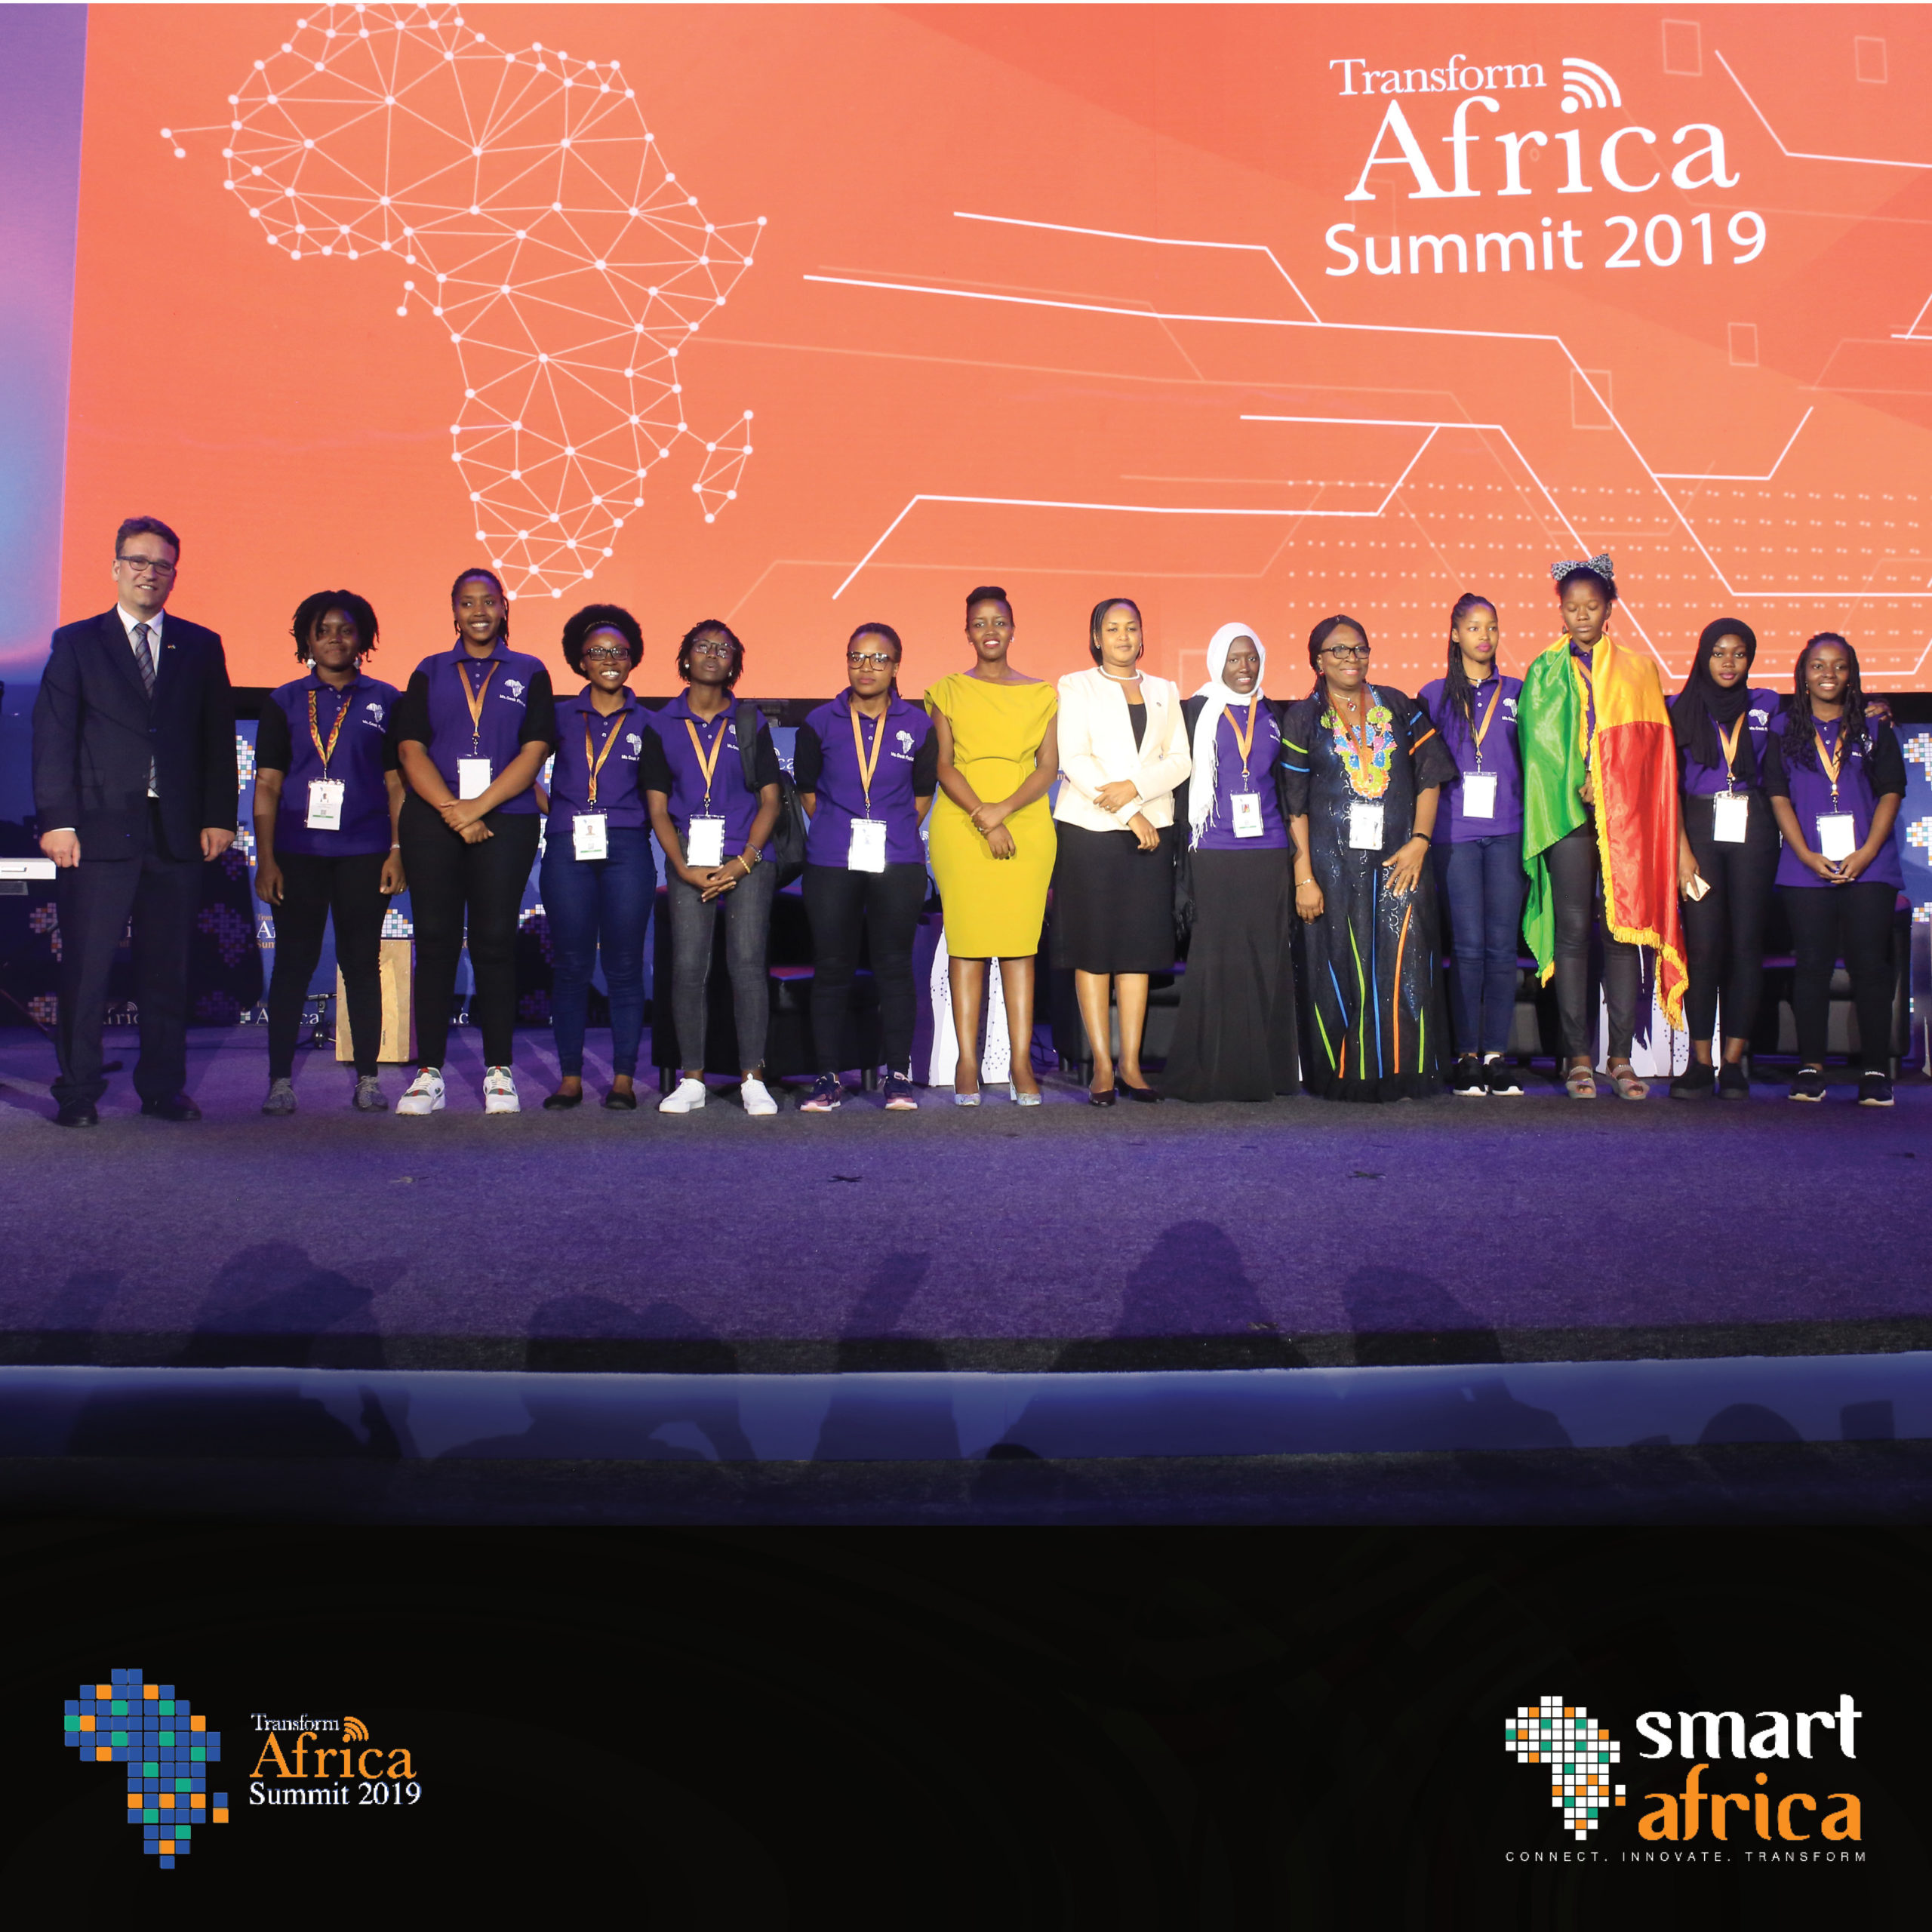 Miss Geek Africa at the Transform Africa Summit